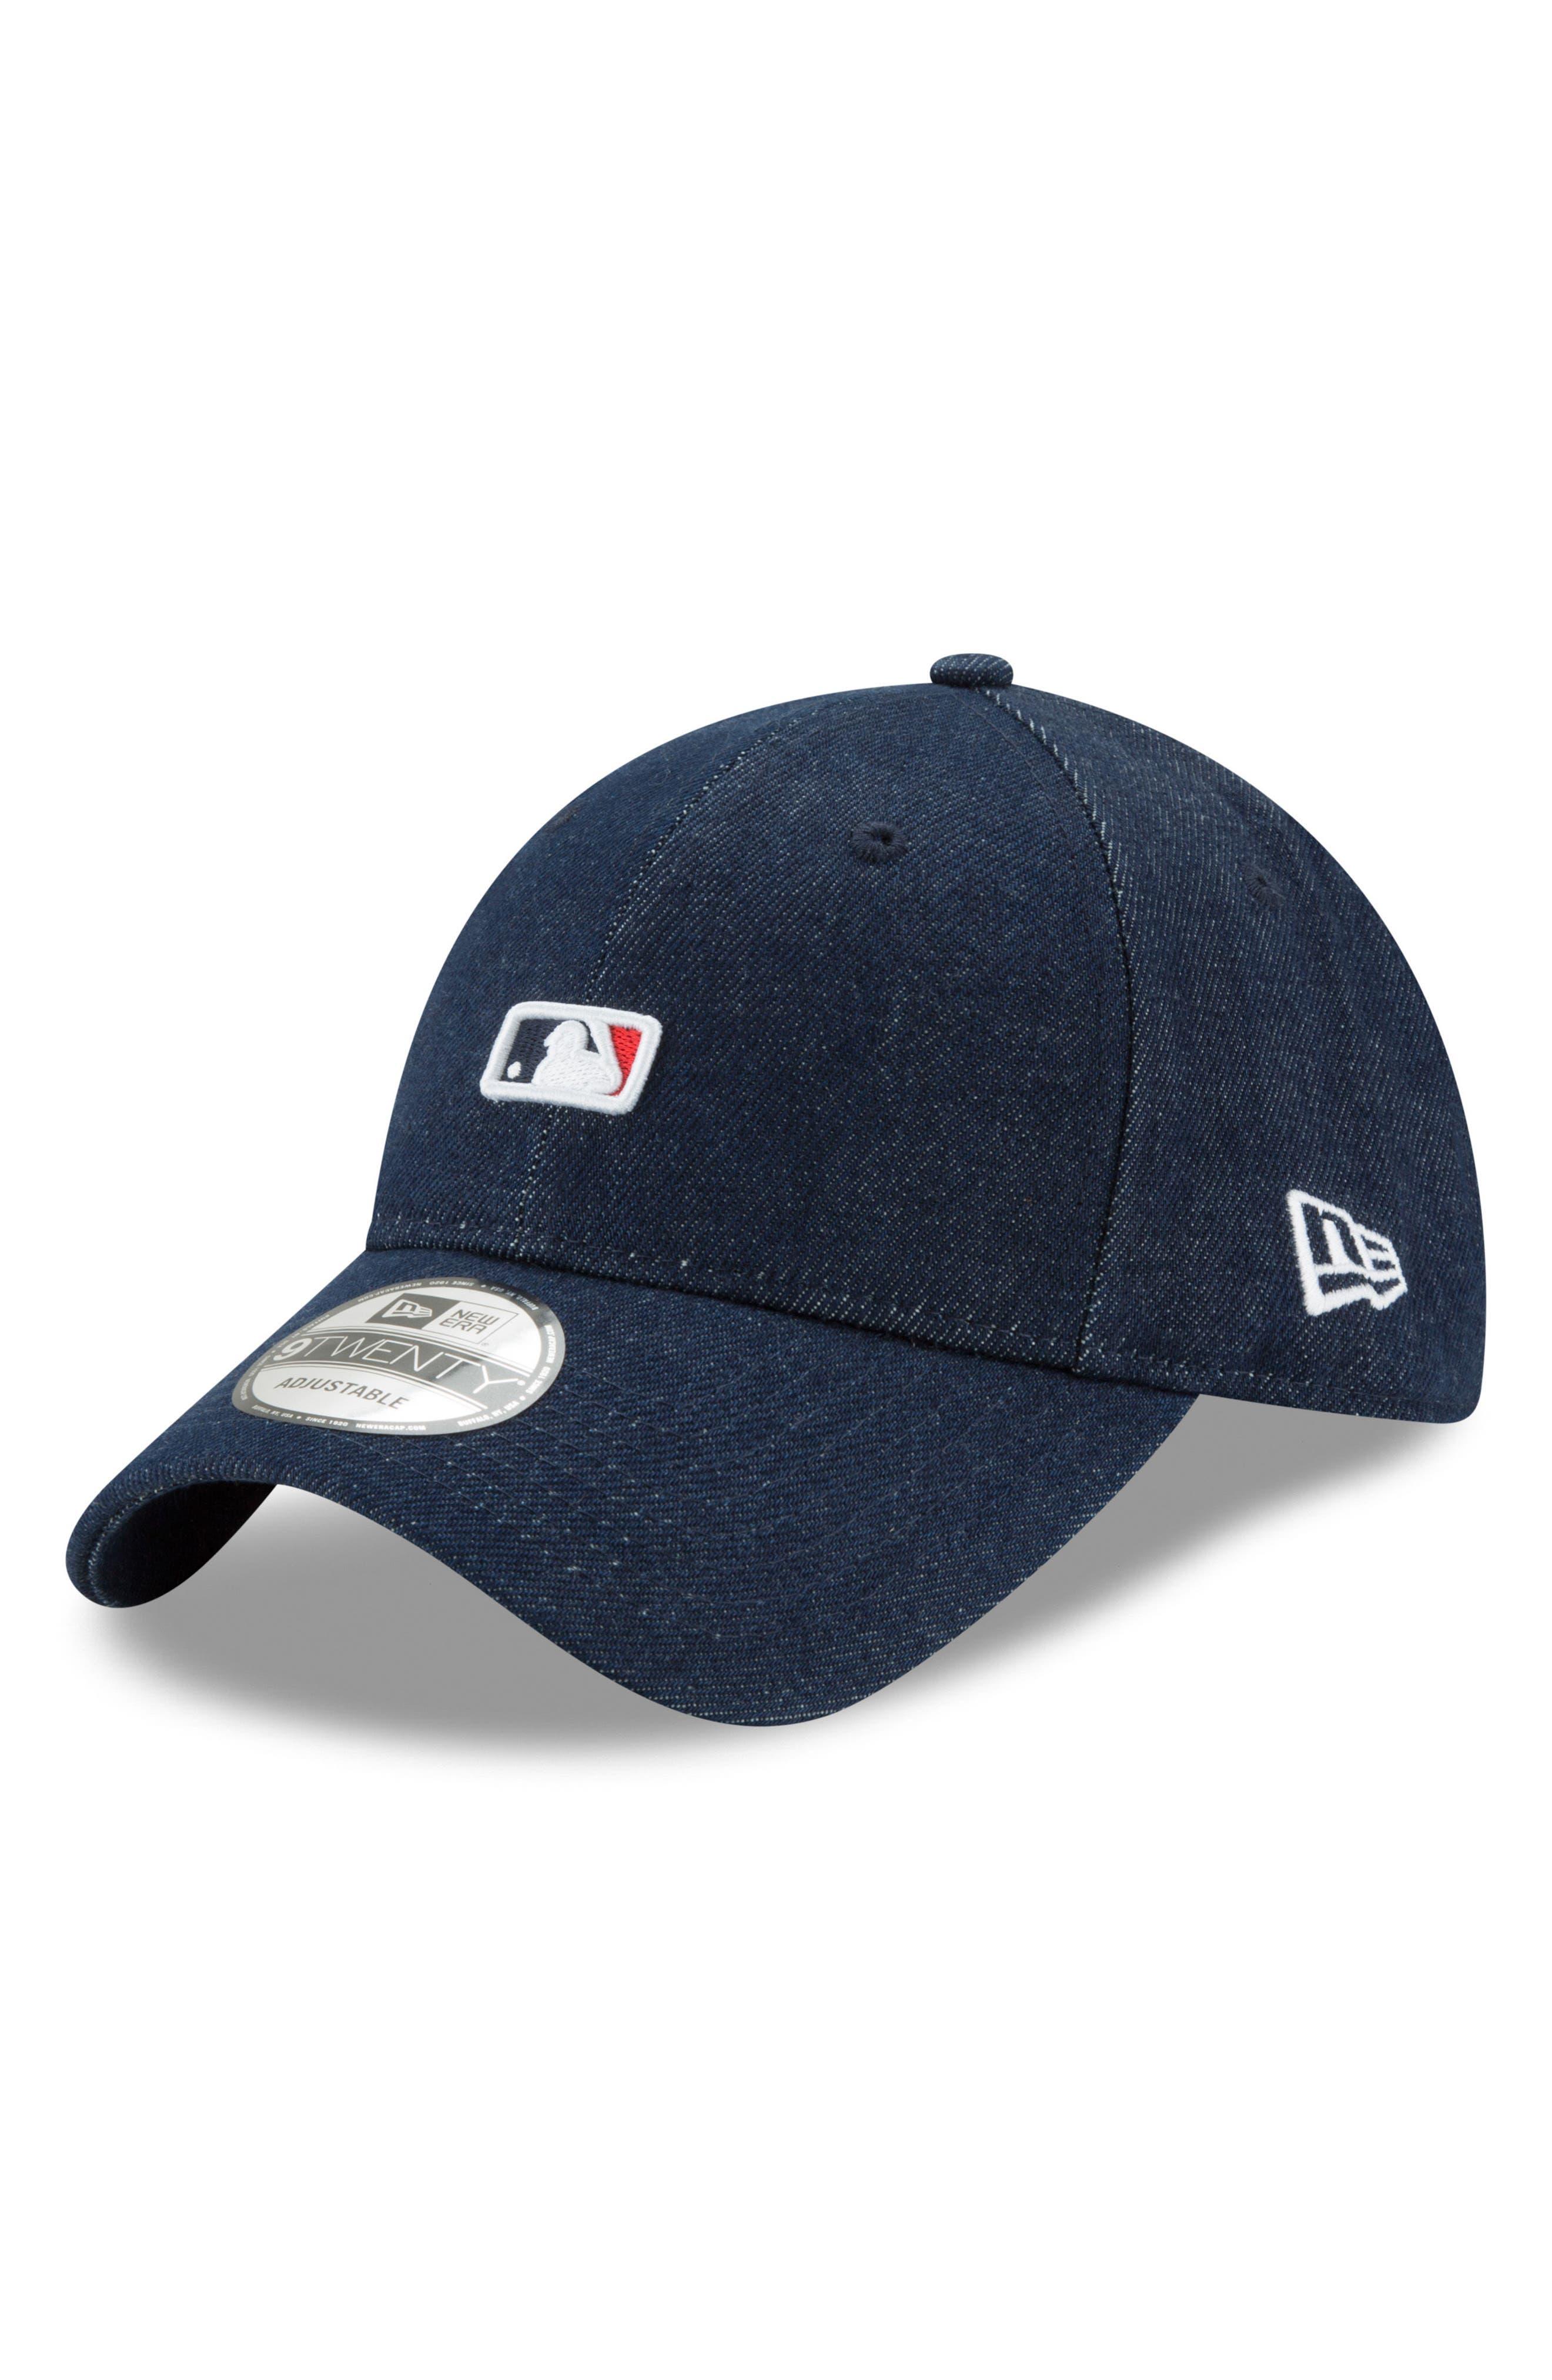 x Levi's<sup>®</sup> MLB Micro Batterman Baseball Cap,                             Main thumbnail 1, color,                             Black